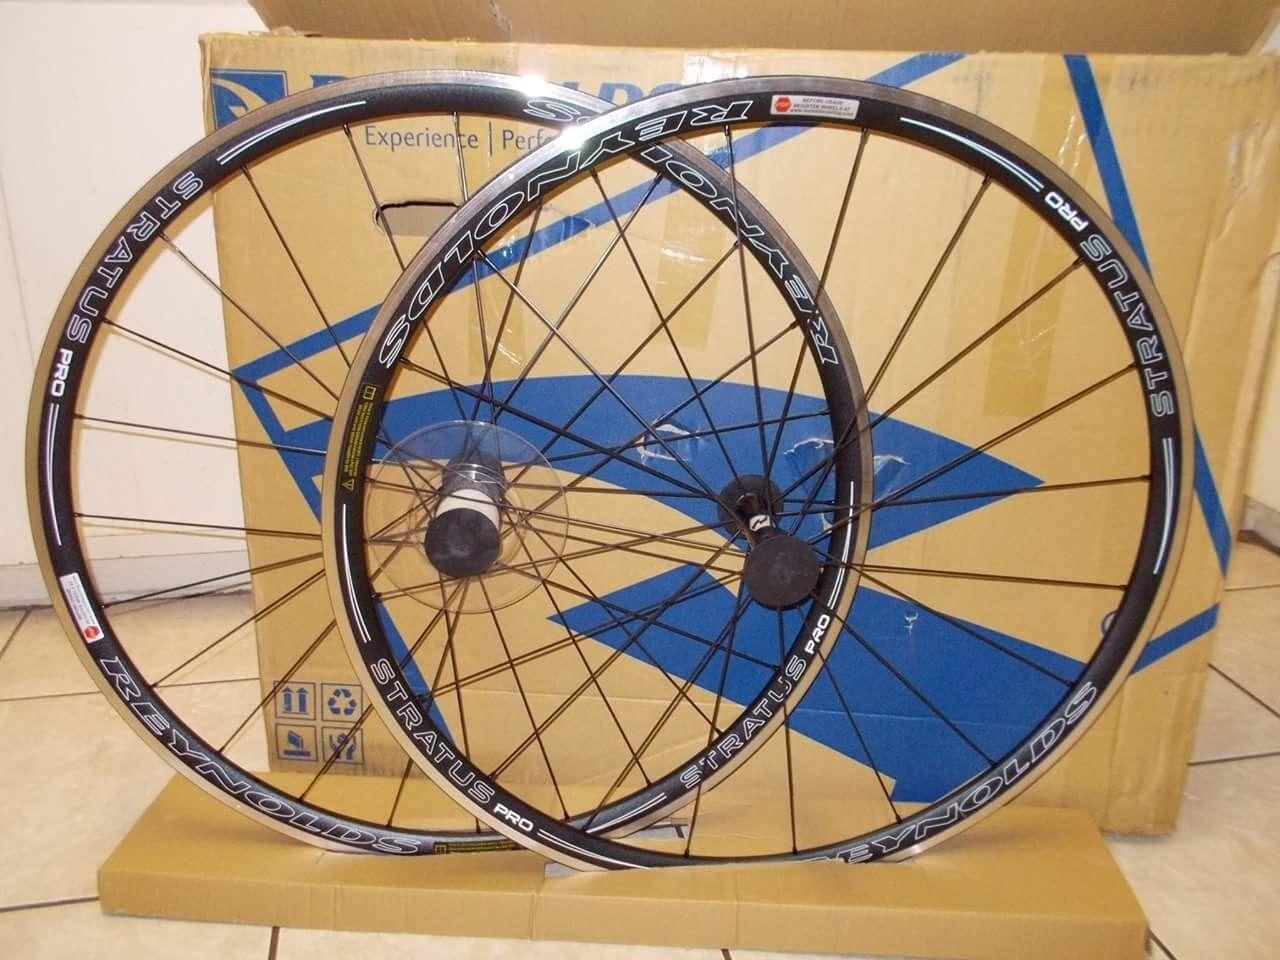 Bicycle wheelset 700c reynolds aluminum stratus pro lightweight 11speed